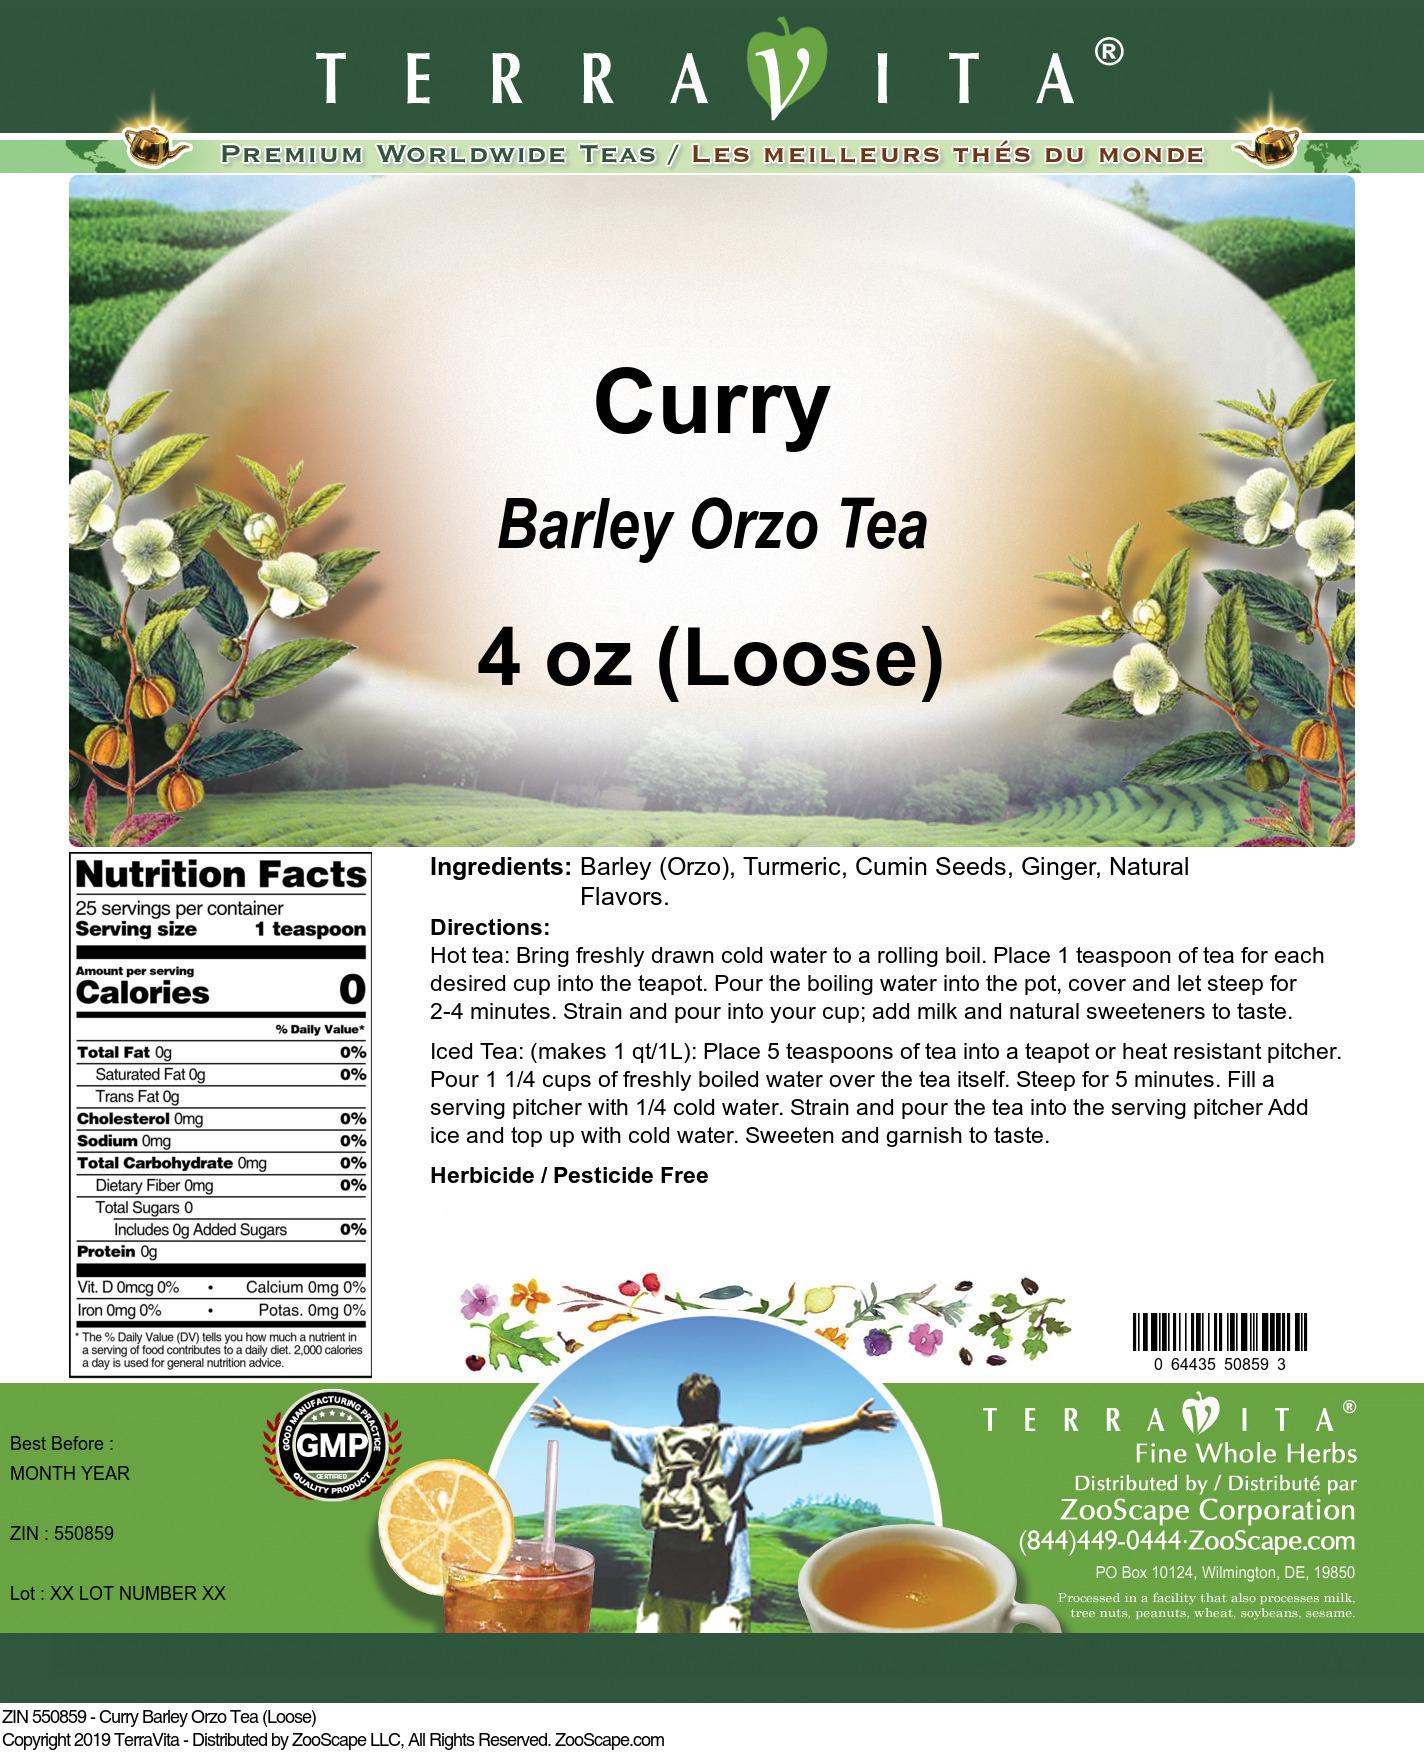 Curry Barley Orzo